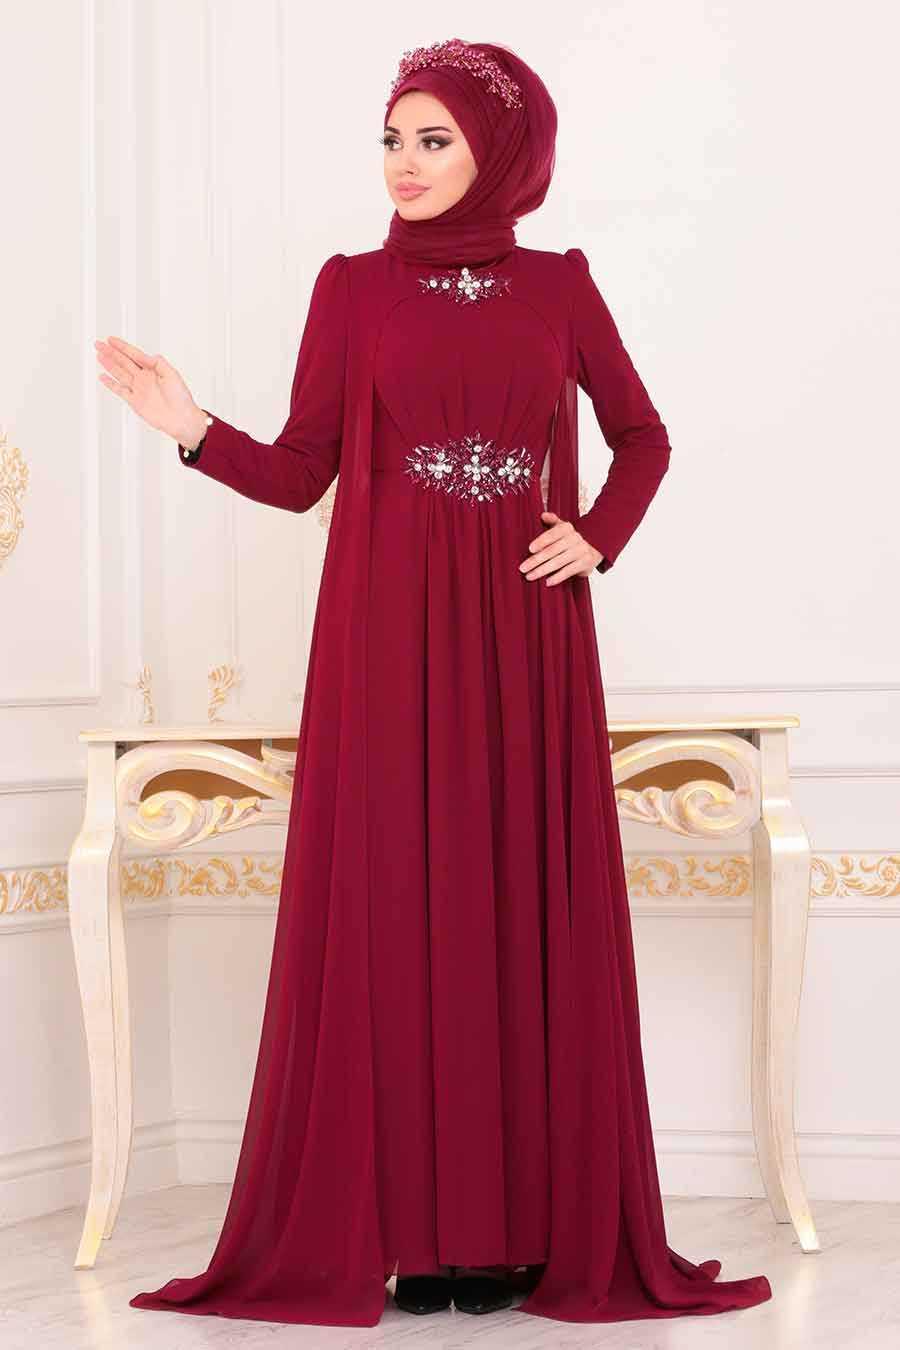 Claret Red Hijab Evening Dress 3851BR